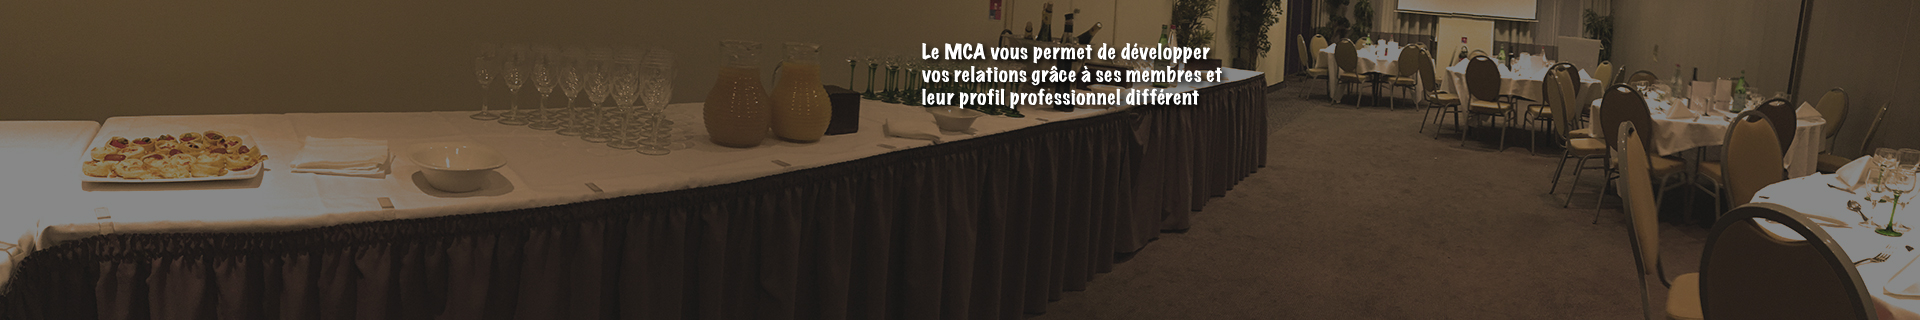 mca2txt.jpg